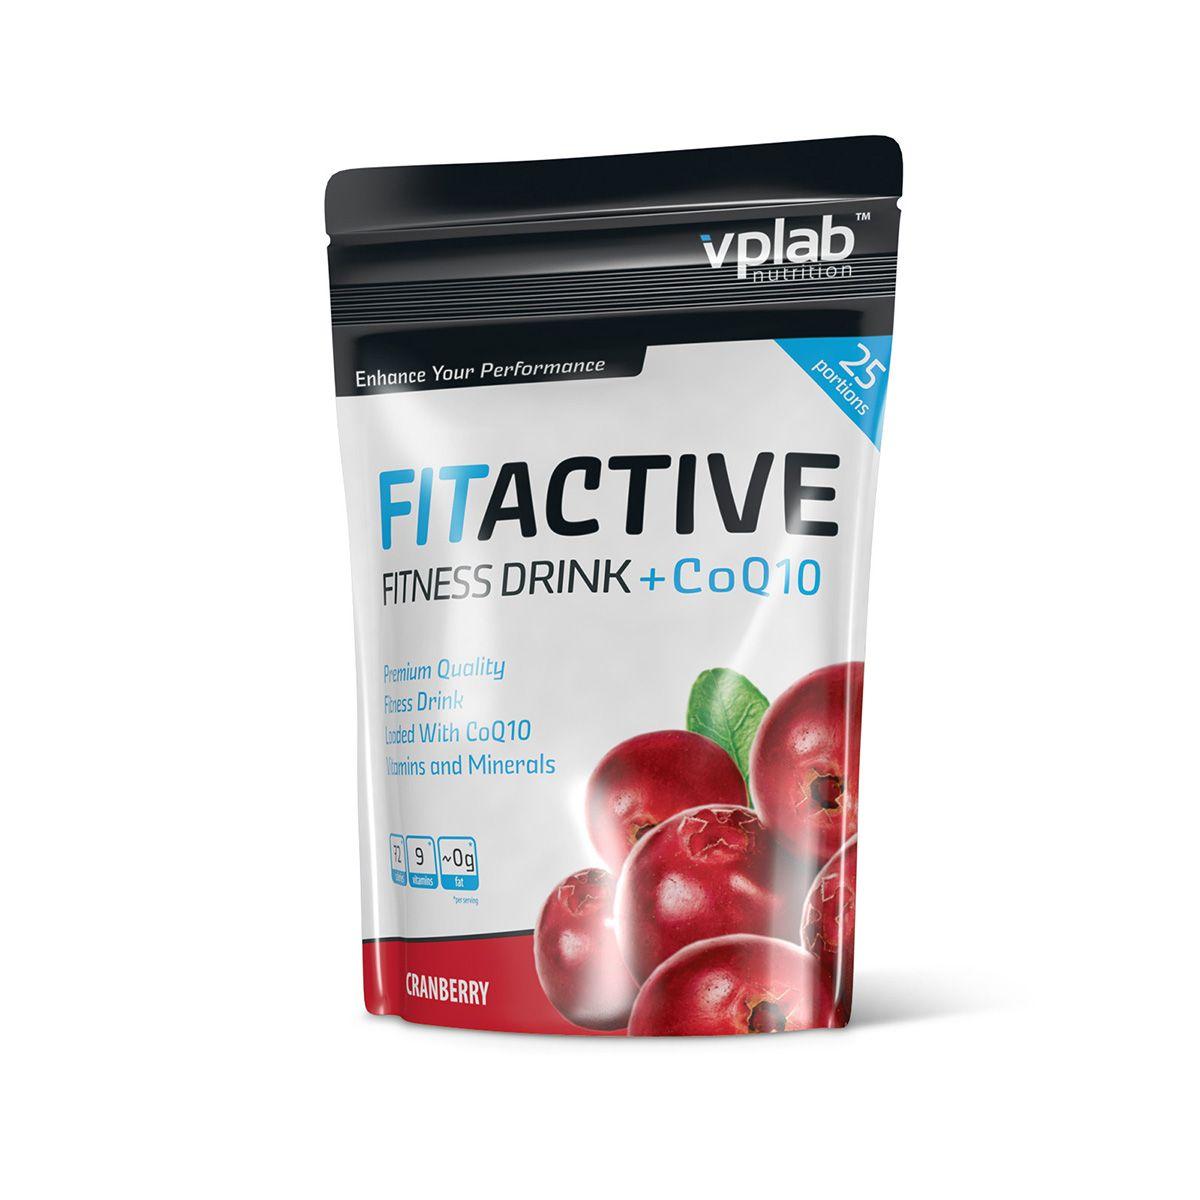 Изотоник VPLab FitActive Fitness Drink +CoQ10, клюква, 500 г coq10 для кожи